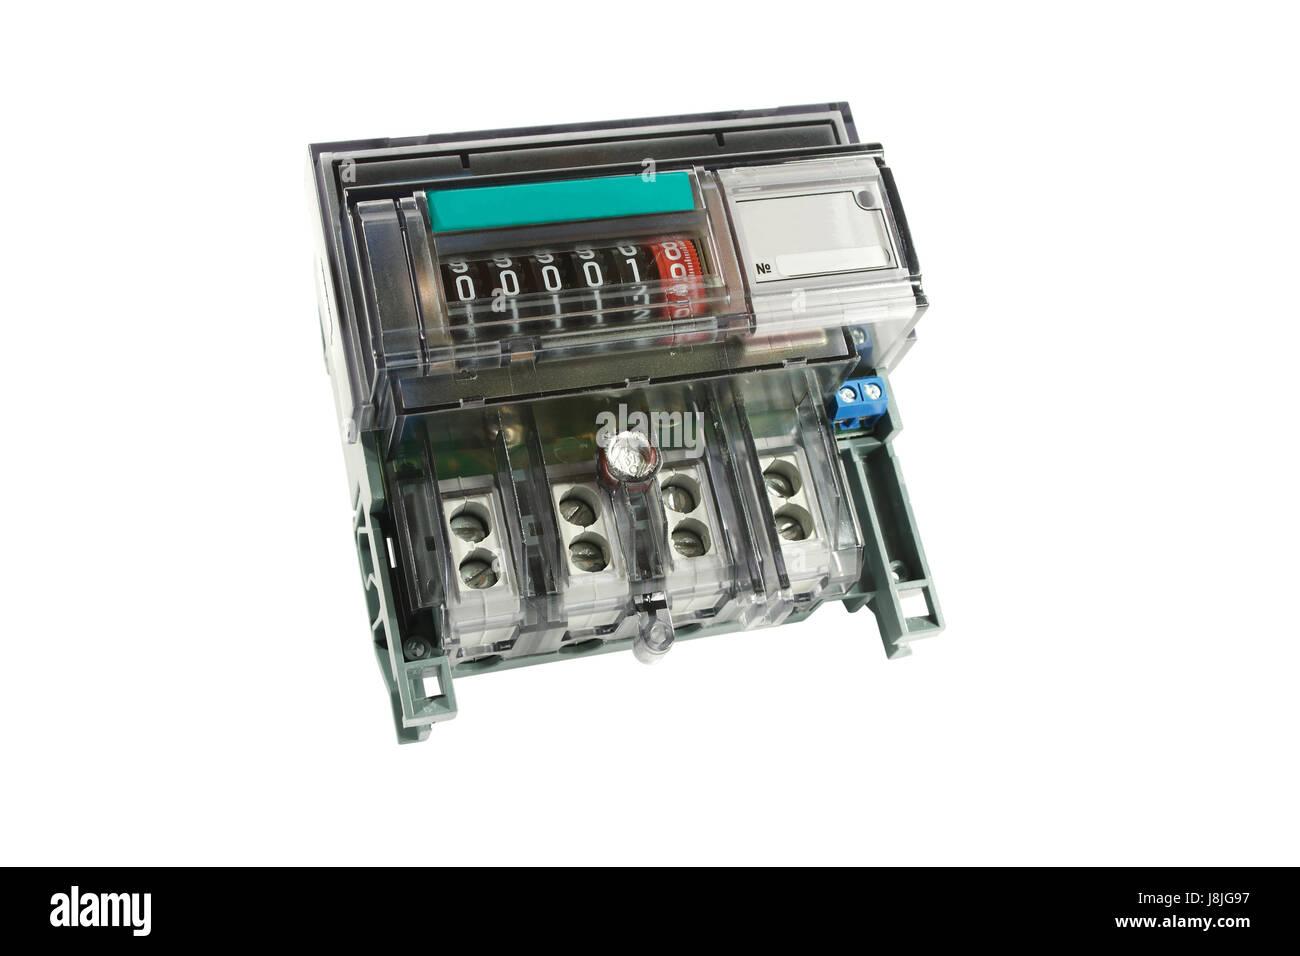 horizontal, technology, reading, number, kilowatt, measuring, component, - Stock Image